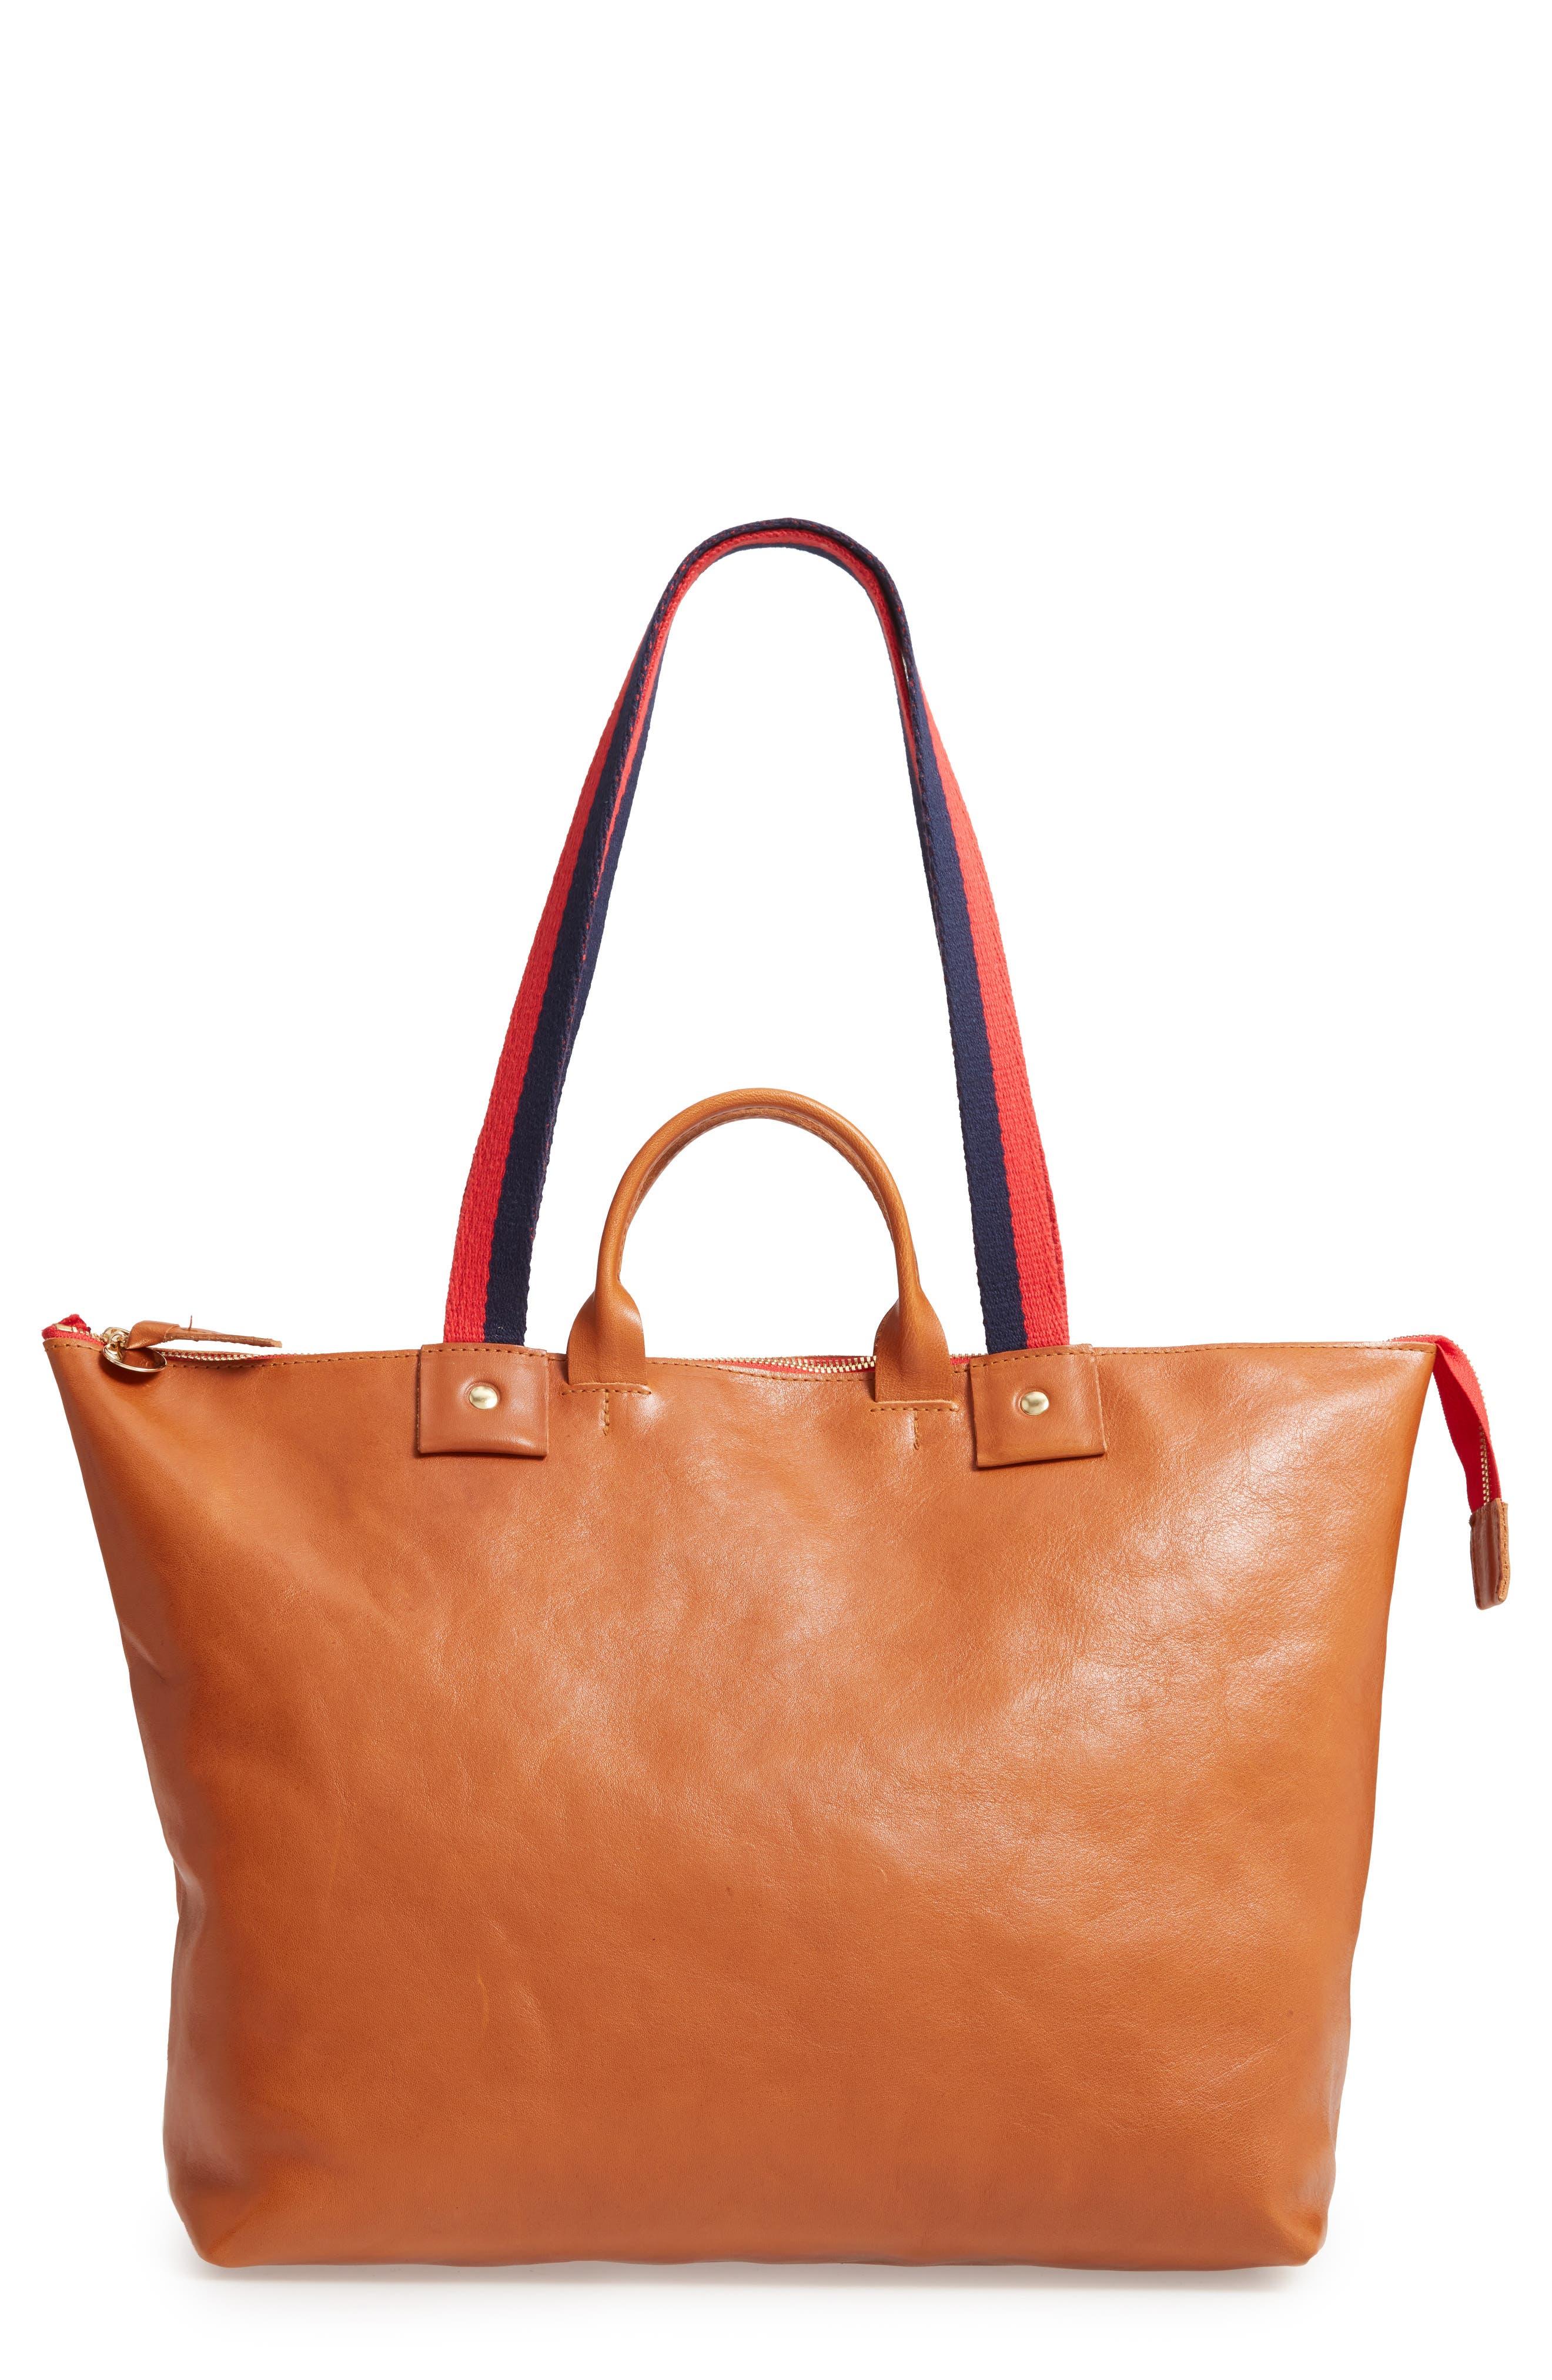 CLARE V. Le Zip Leather Tote, Main, color, MIEL RUSTIC